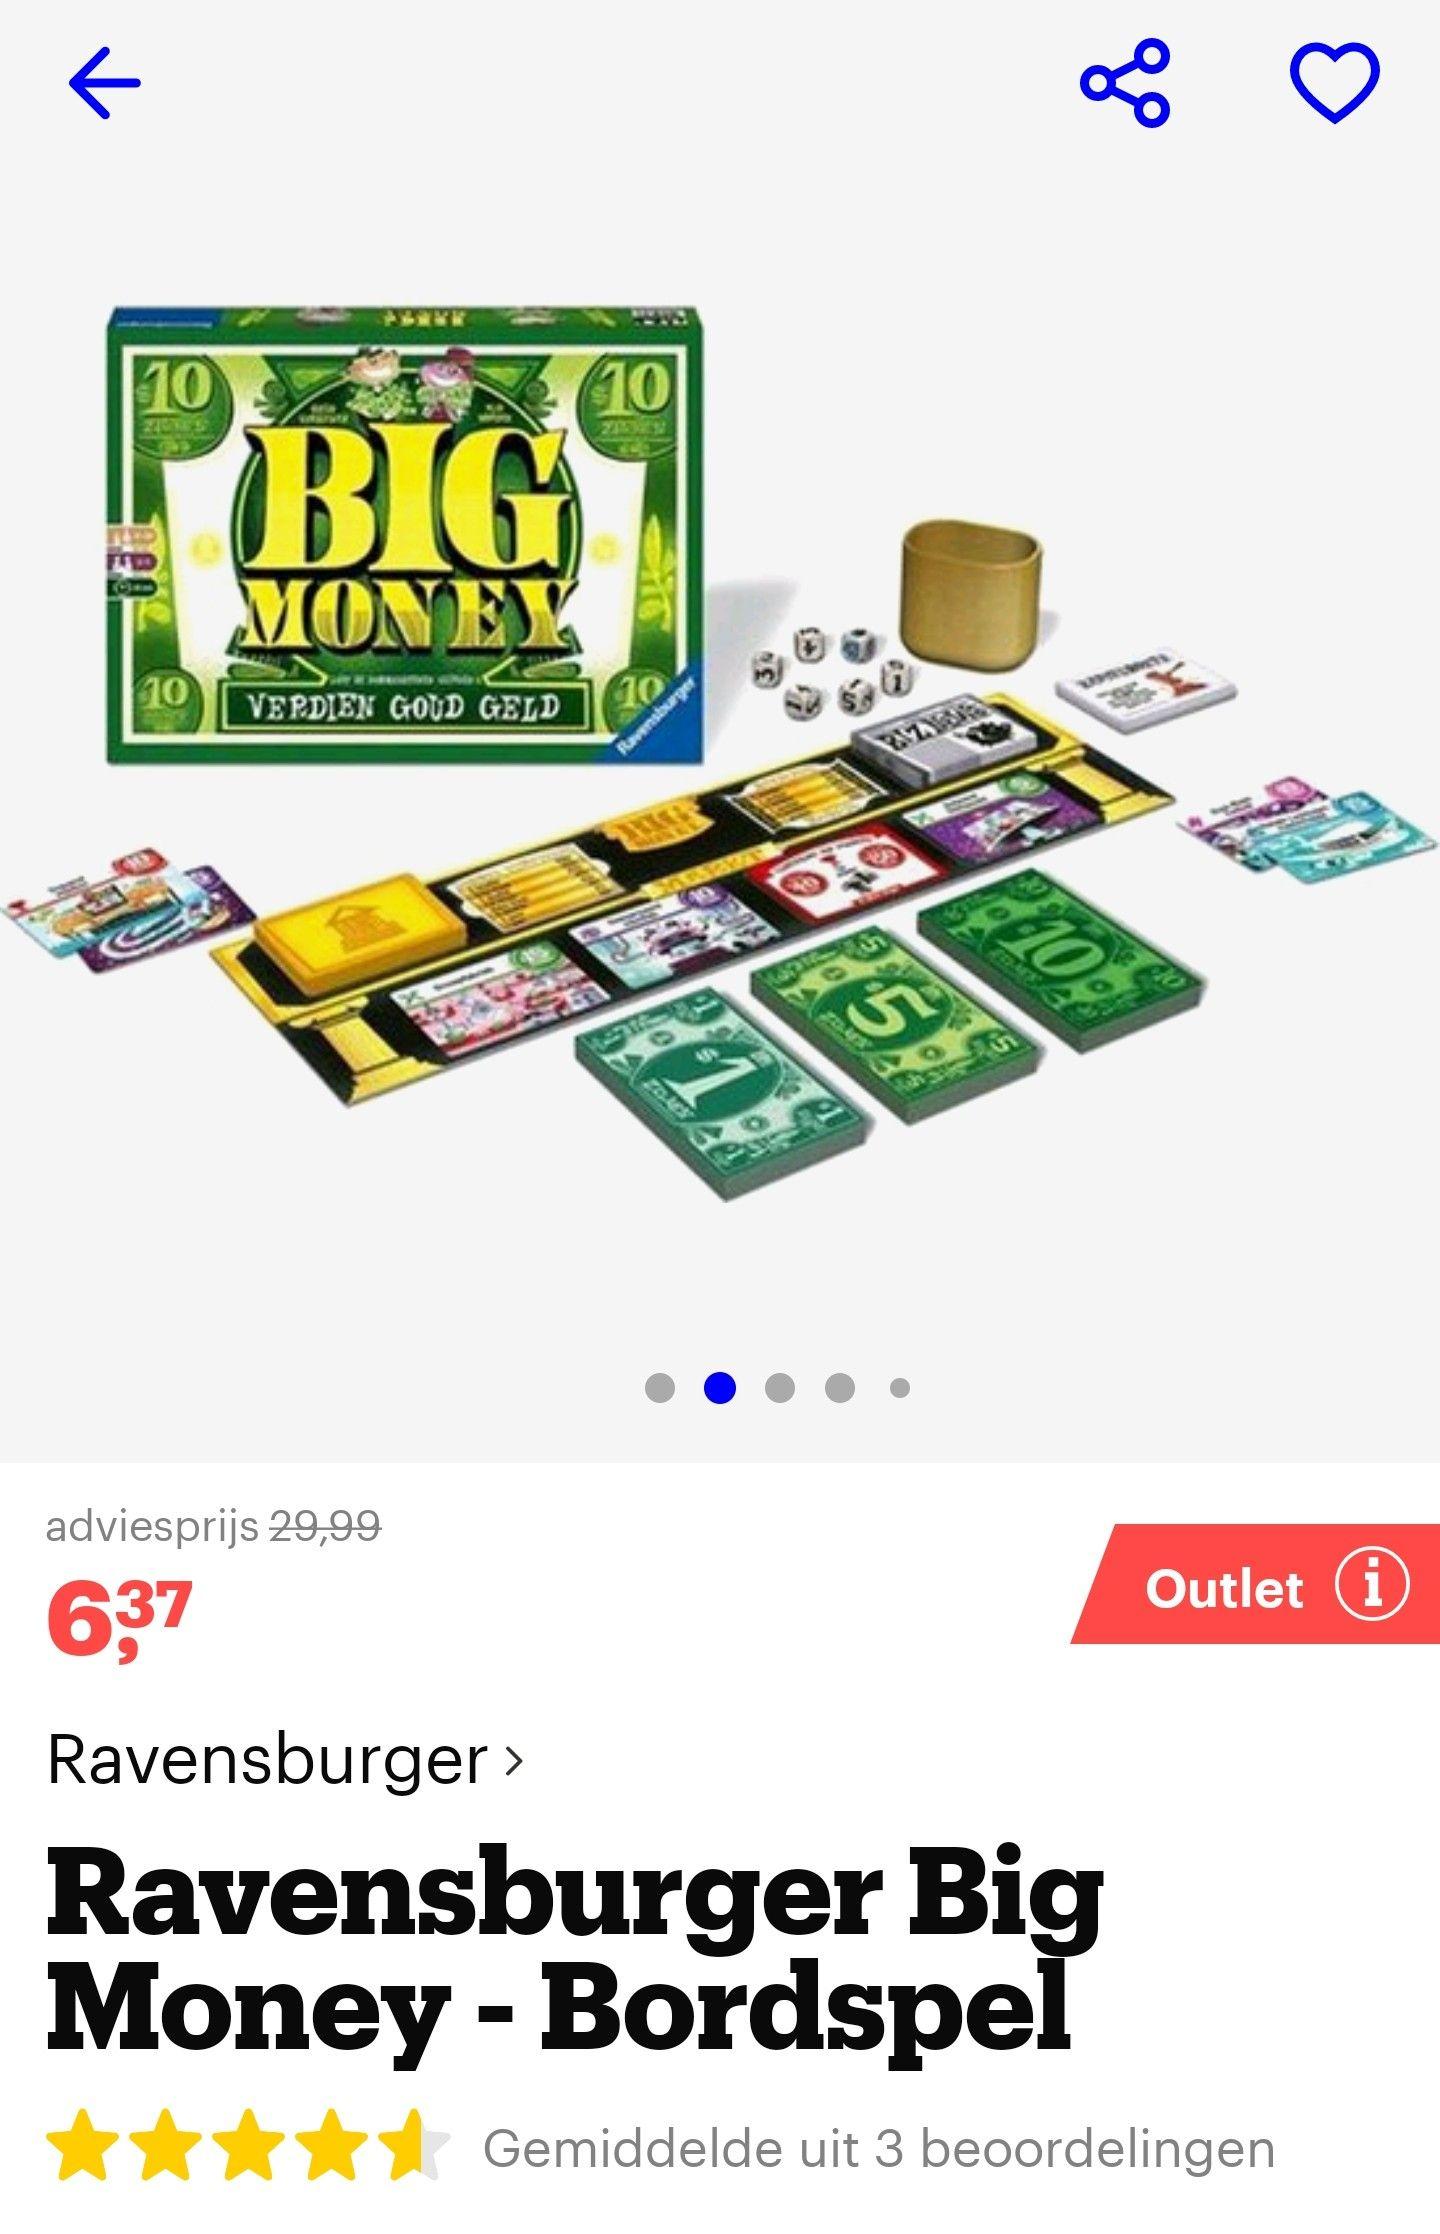 Ravensburger Big Money bordspel